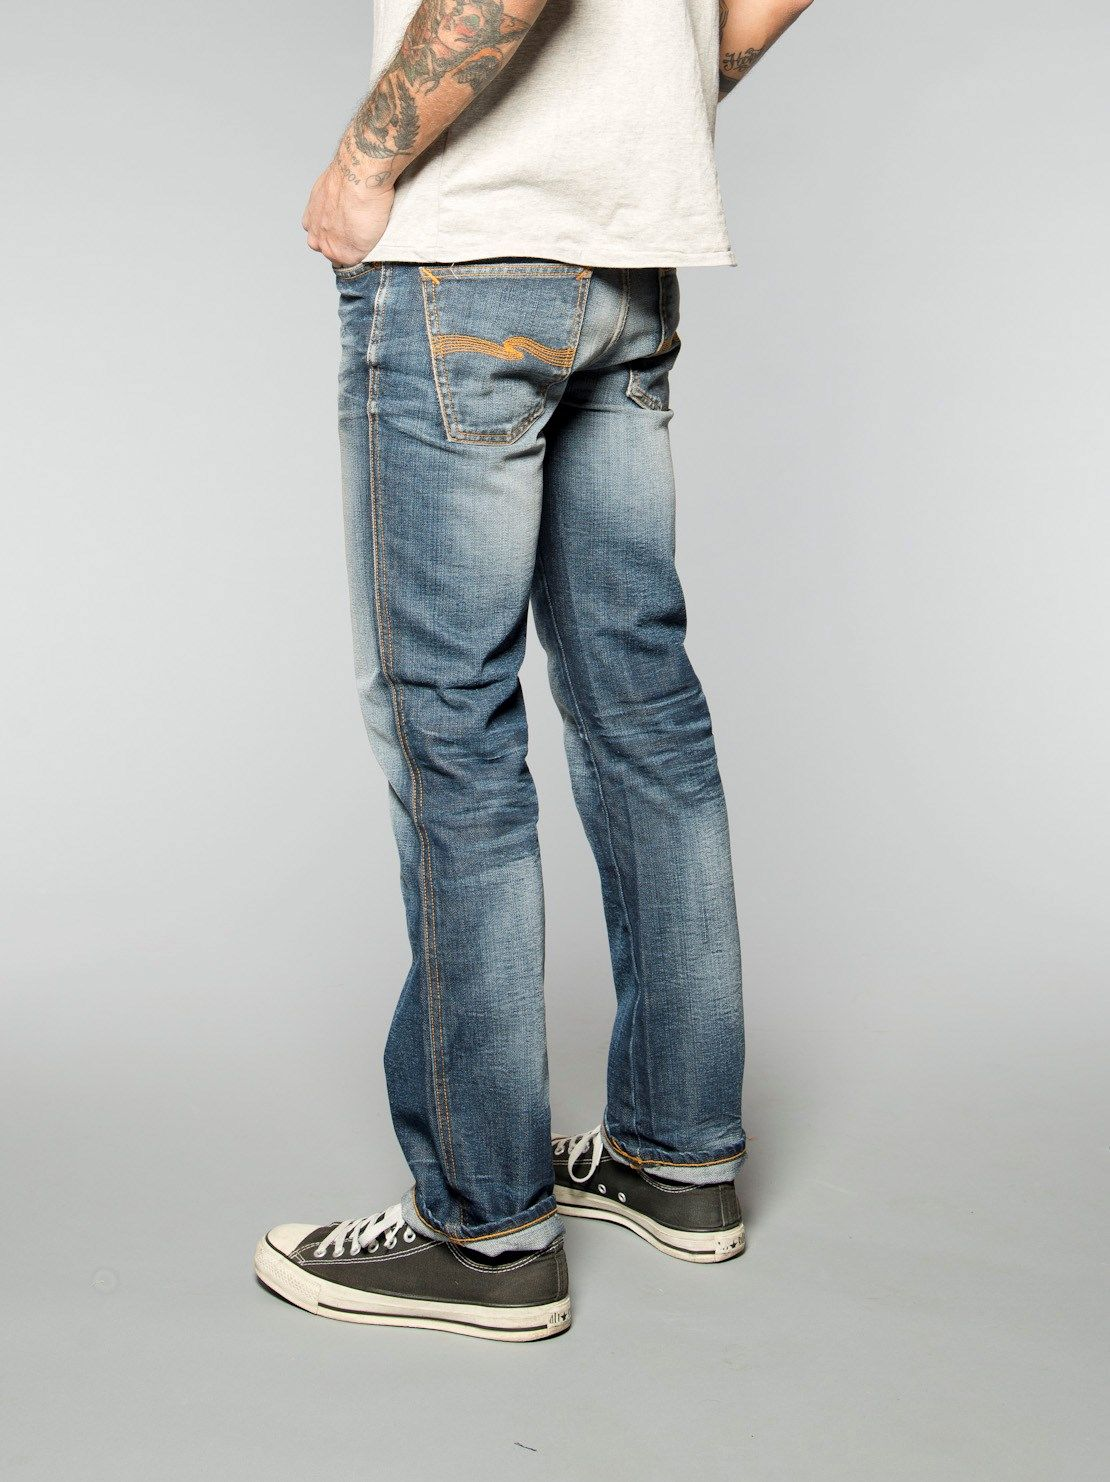 d786fad0d96ee4 Slim Jim Organic Martin Replica - Nudie Jeans Co Online Shop | Just ...